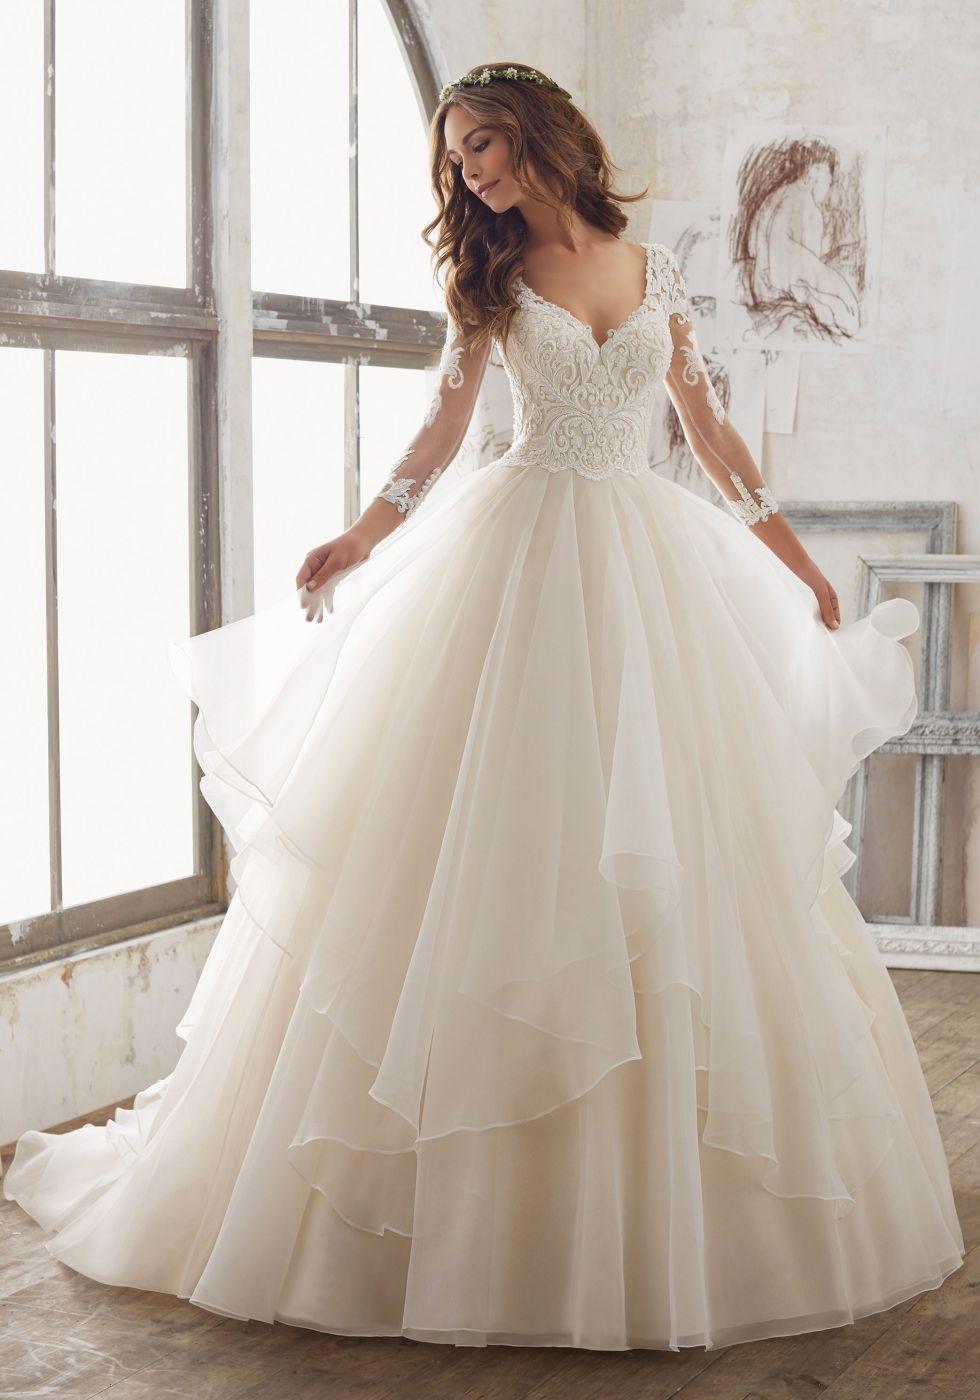 Fantasy Bridal Wedding Dress Store In Salt Lake City Utah 404 Error Wedding Dresses Spring 2017 Wedding Dresses Bridal Gowns